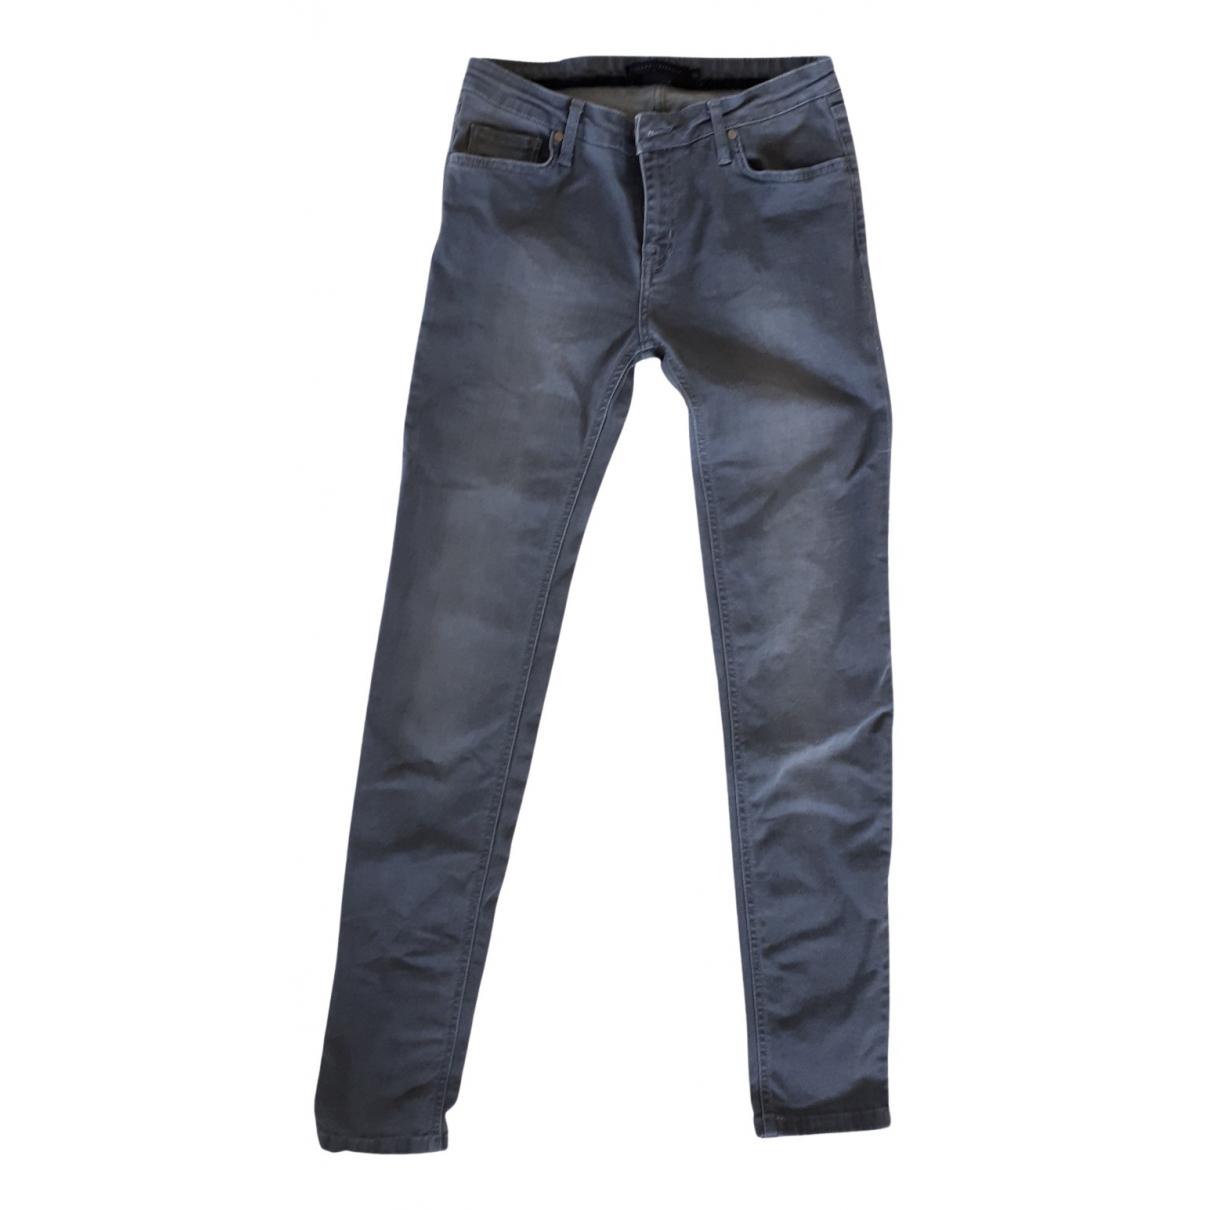 Victoria Beckham N Grey Denim - Jeans Jeans for Women 27 US